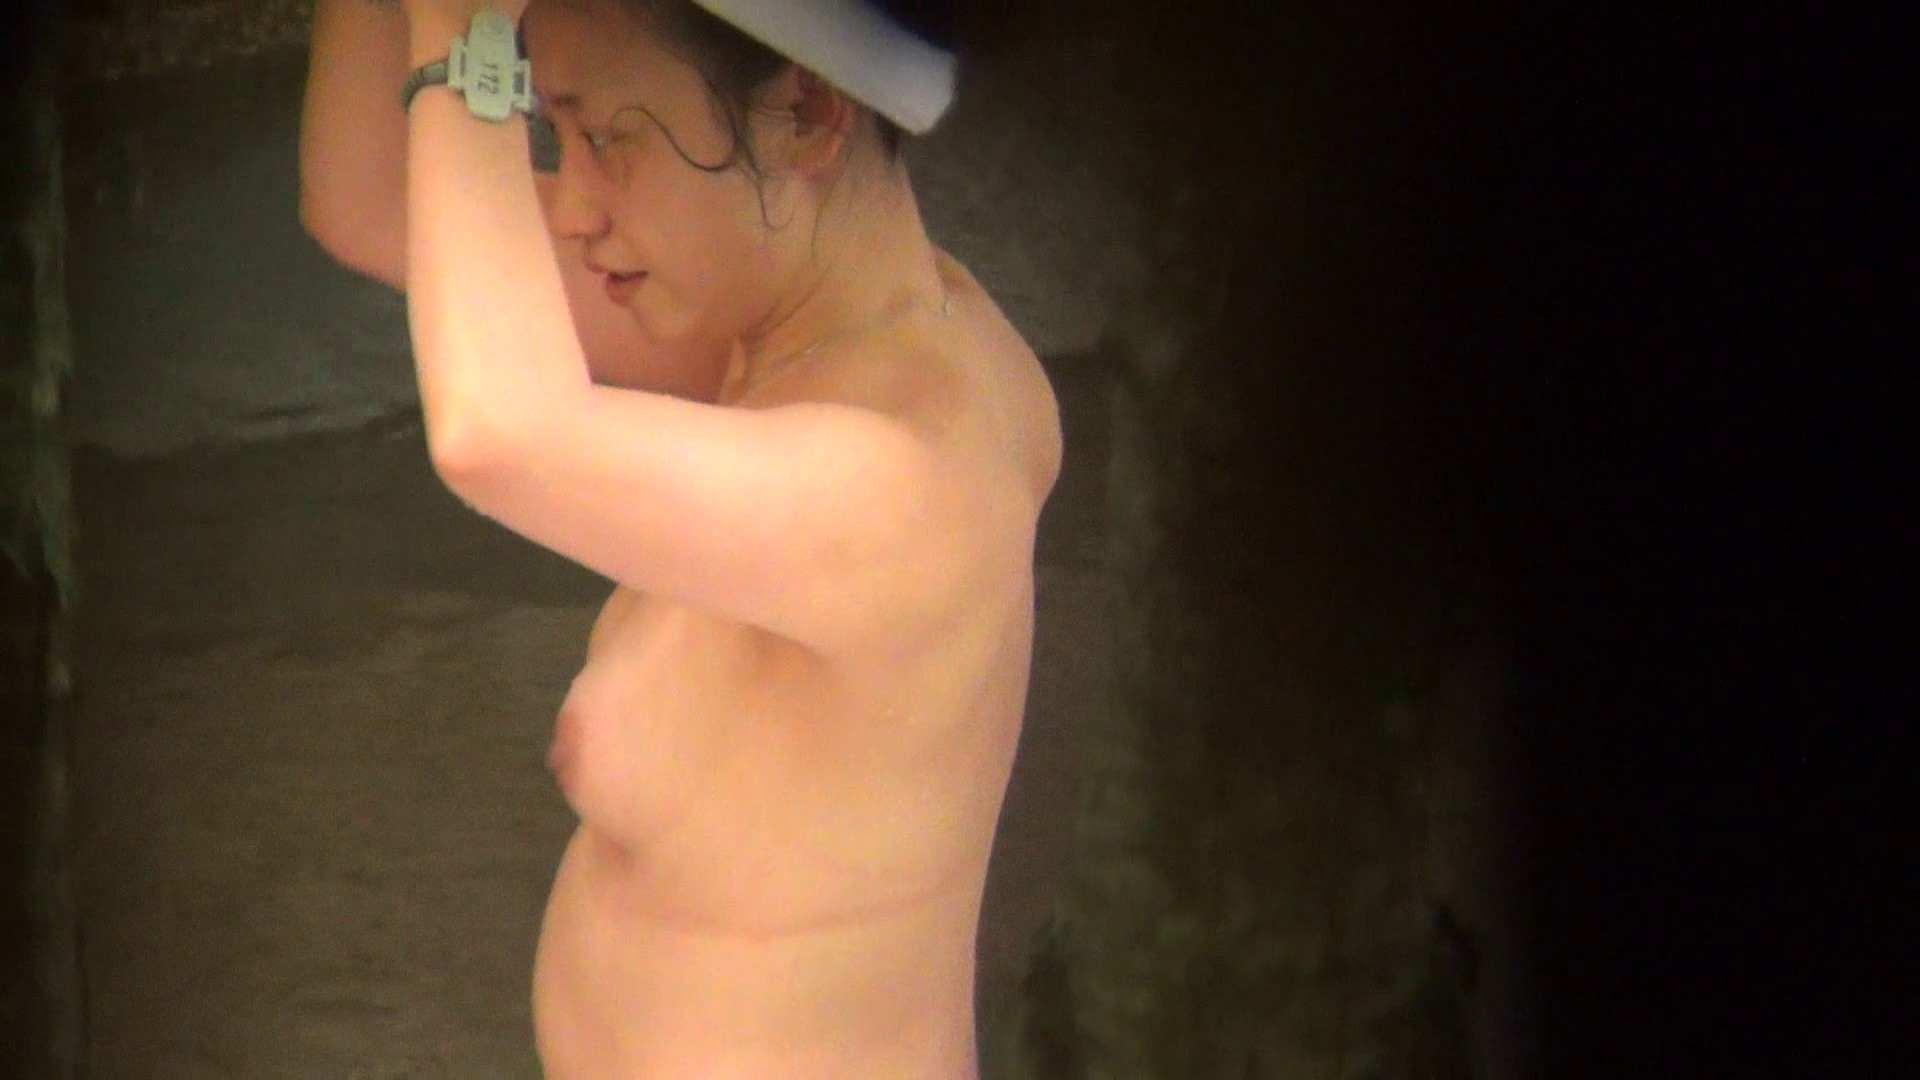 Vol.80 出産経験済みの弛んだ肉体と大胆すぎるアングル 美女のボディ | 露天  54PIX 49